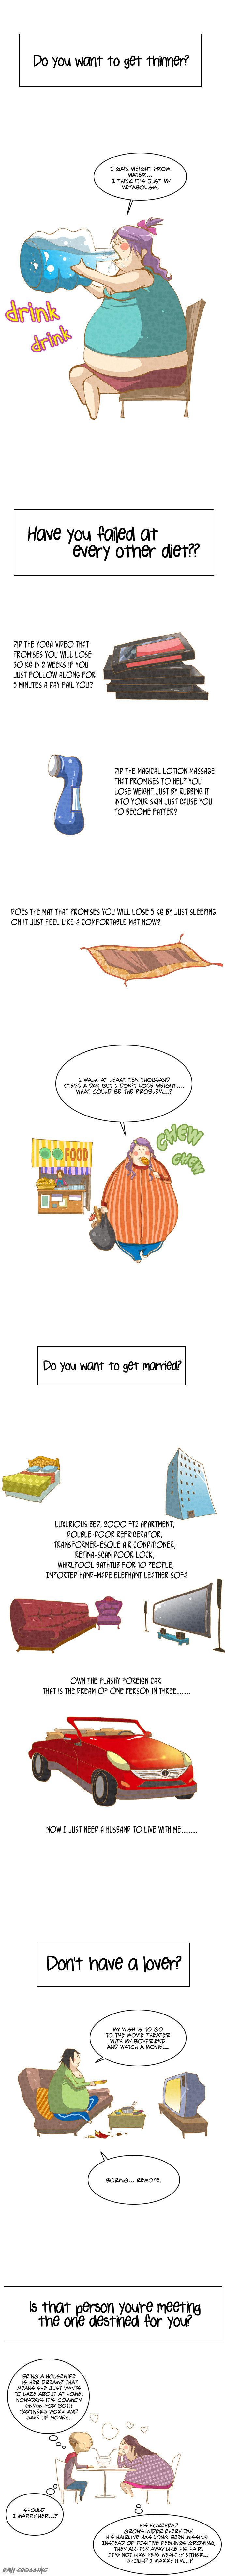 Tarot Shop 0 Page 2